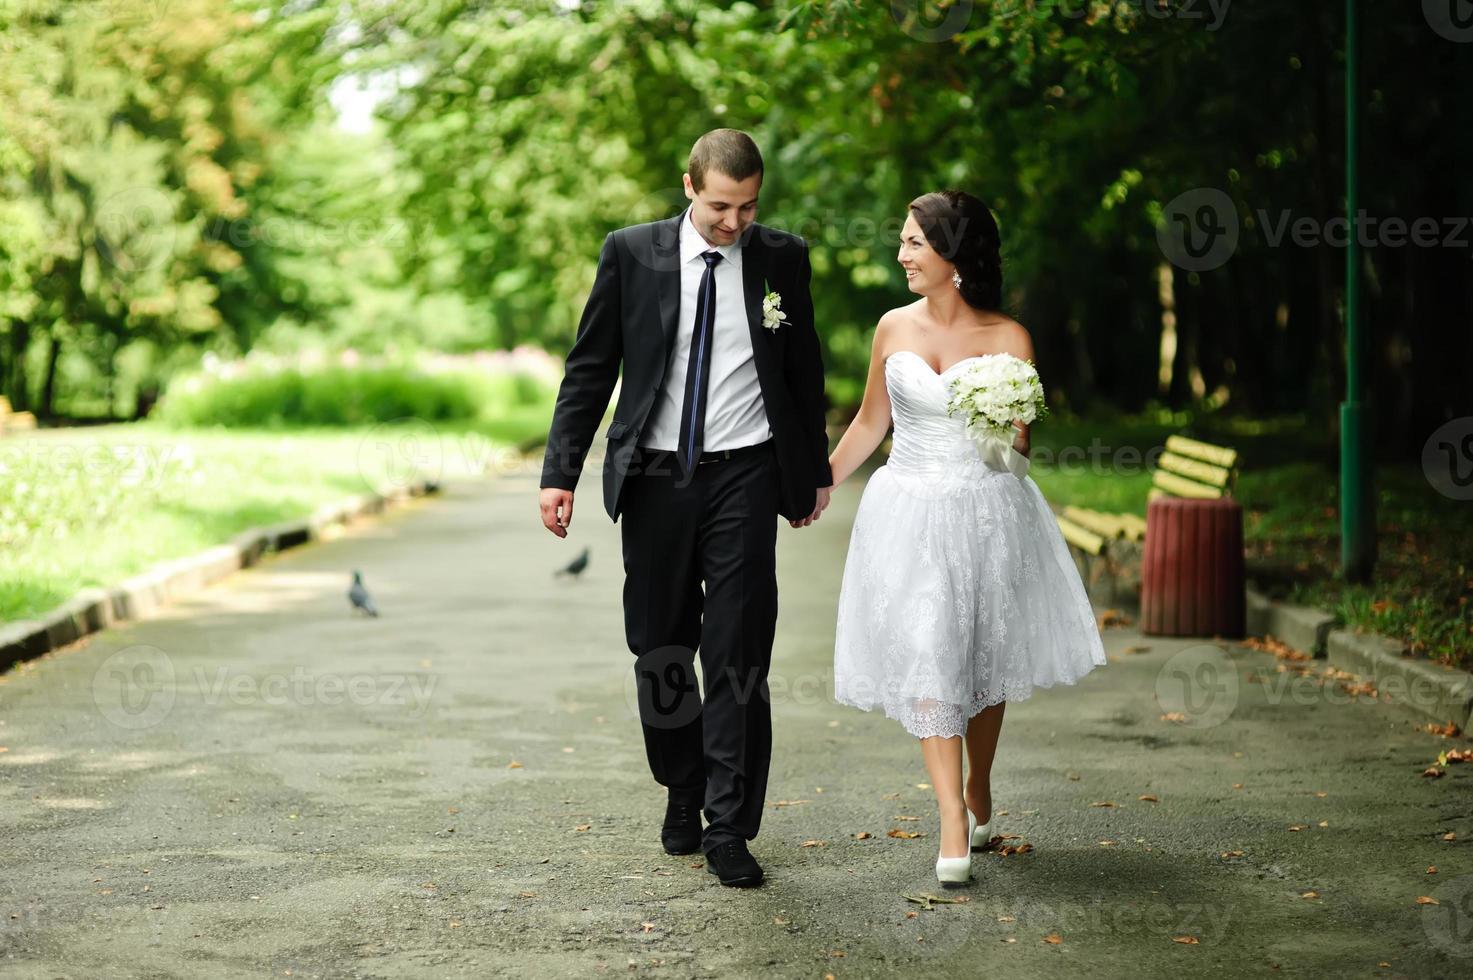 jovem casal caucasiano feliz juntos. foto